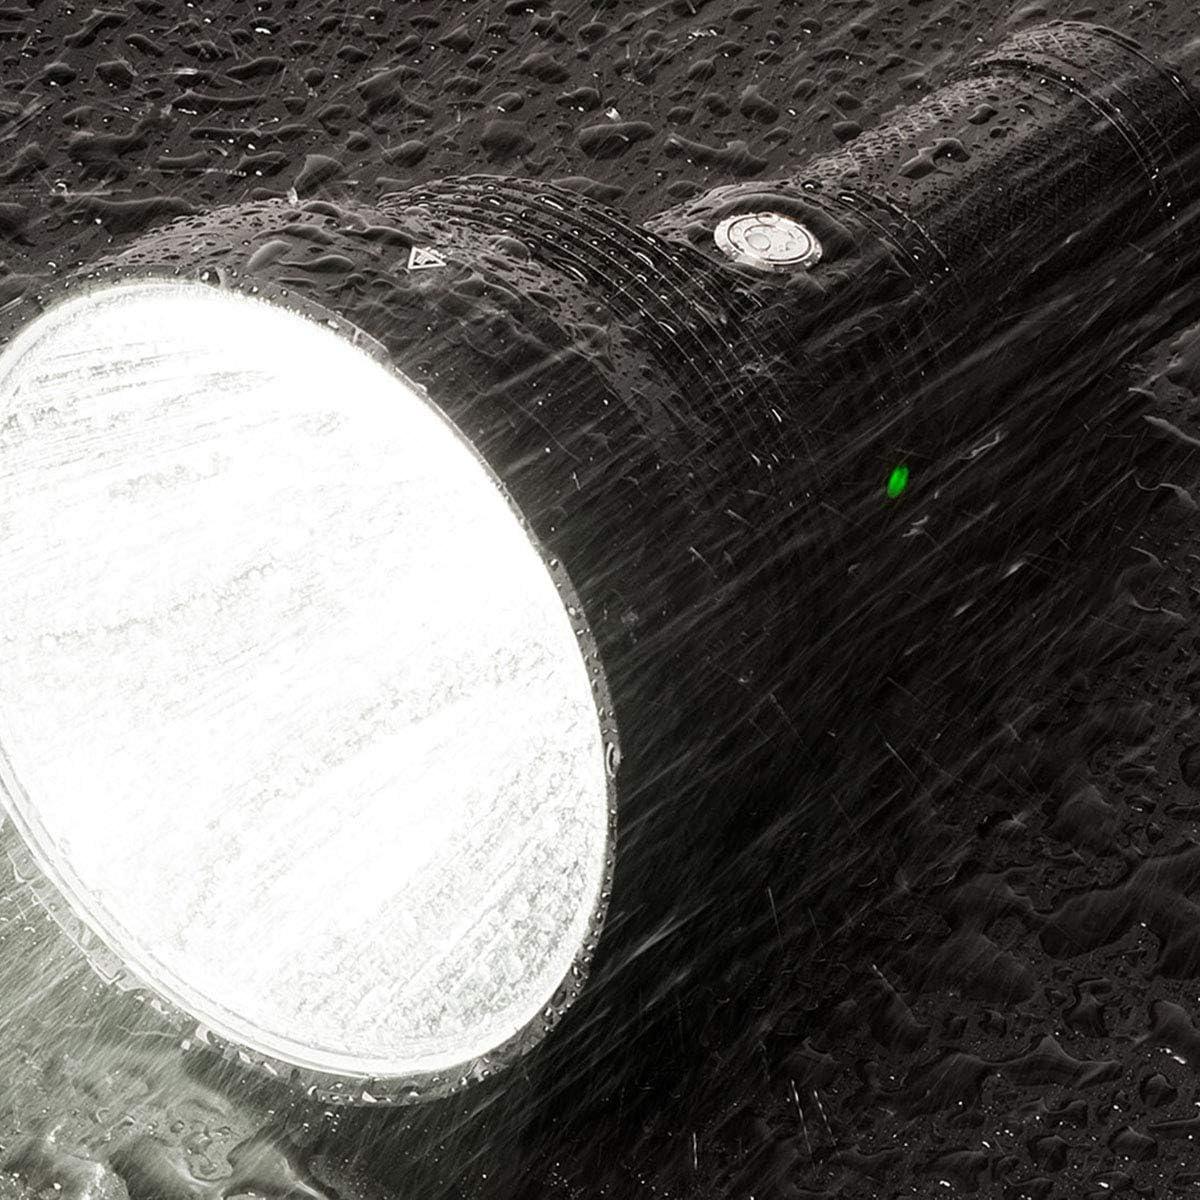 bater/ía incluida 6300 l/úmenes s/úper brillante linterna LED ACEBEAM K75 linterna ultra larga de 2500 metros